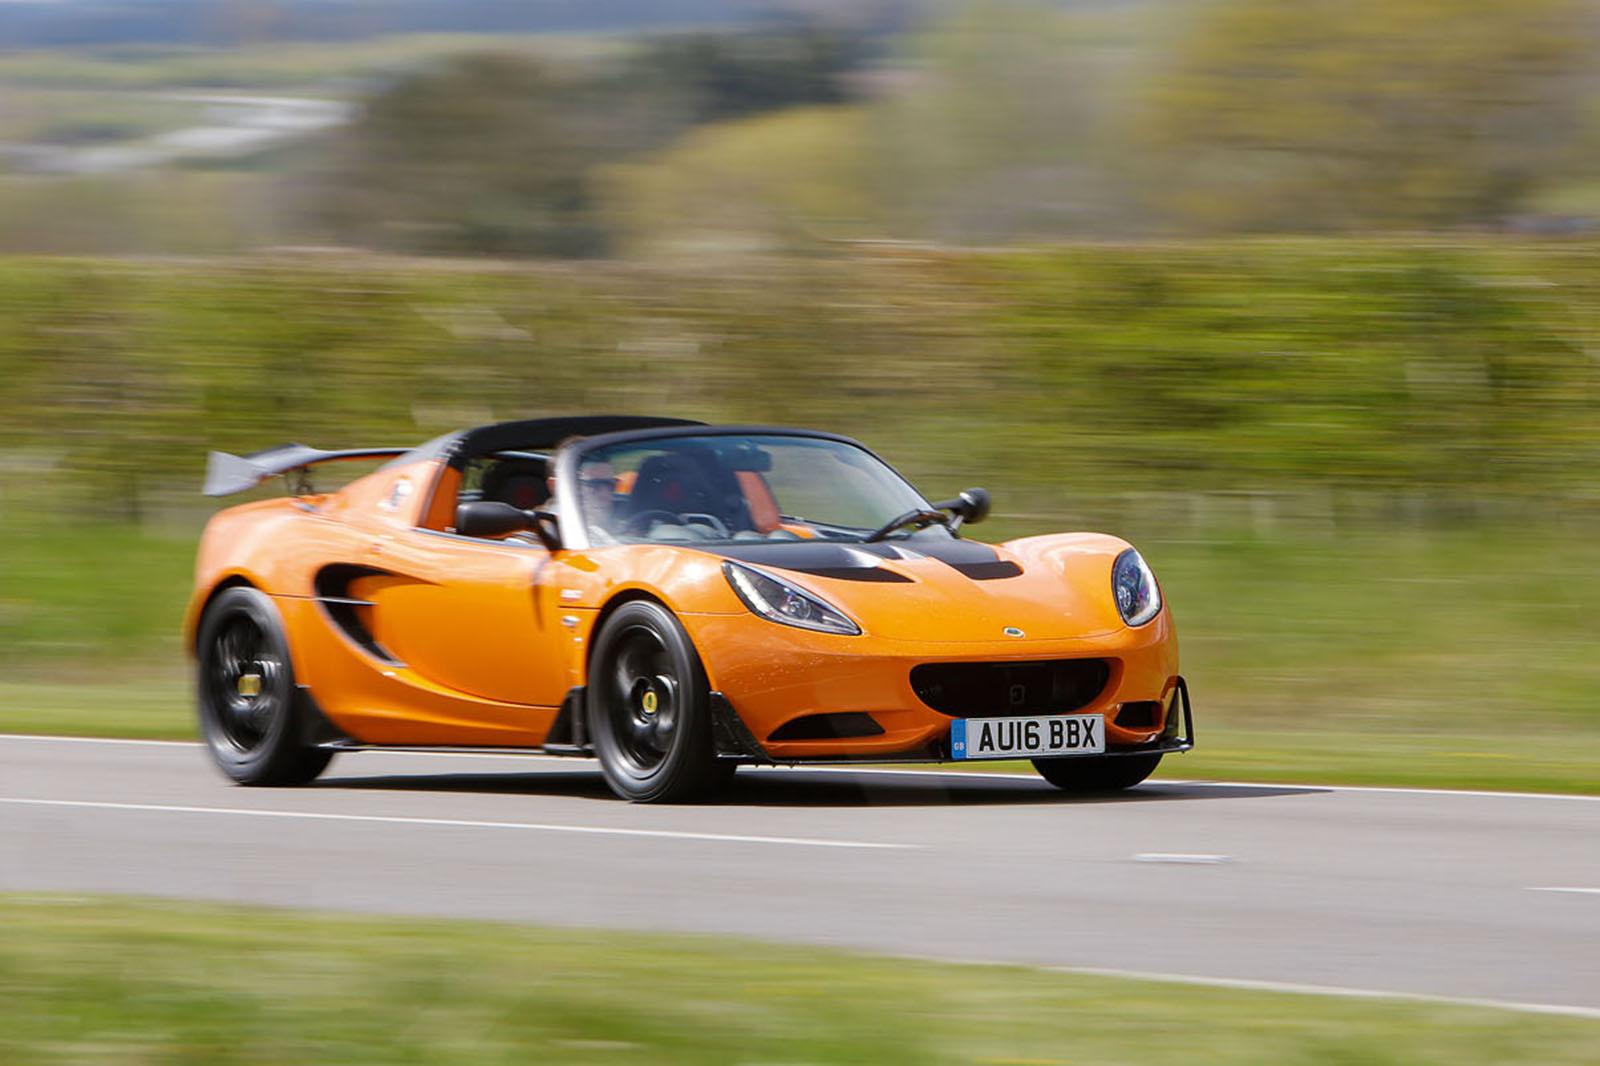 New Lotus Esprit Supercar To Hit Roads In 2020